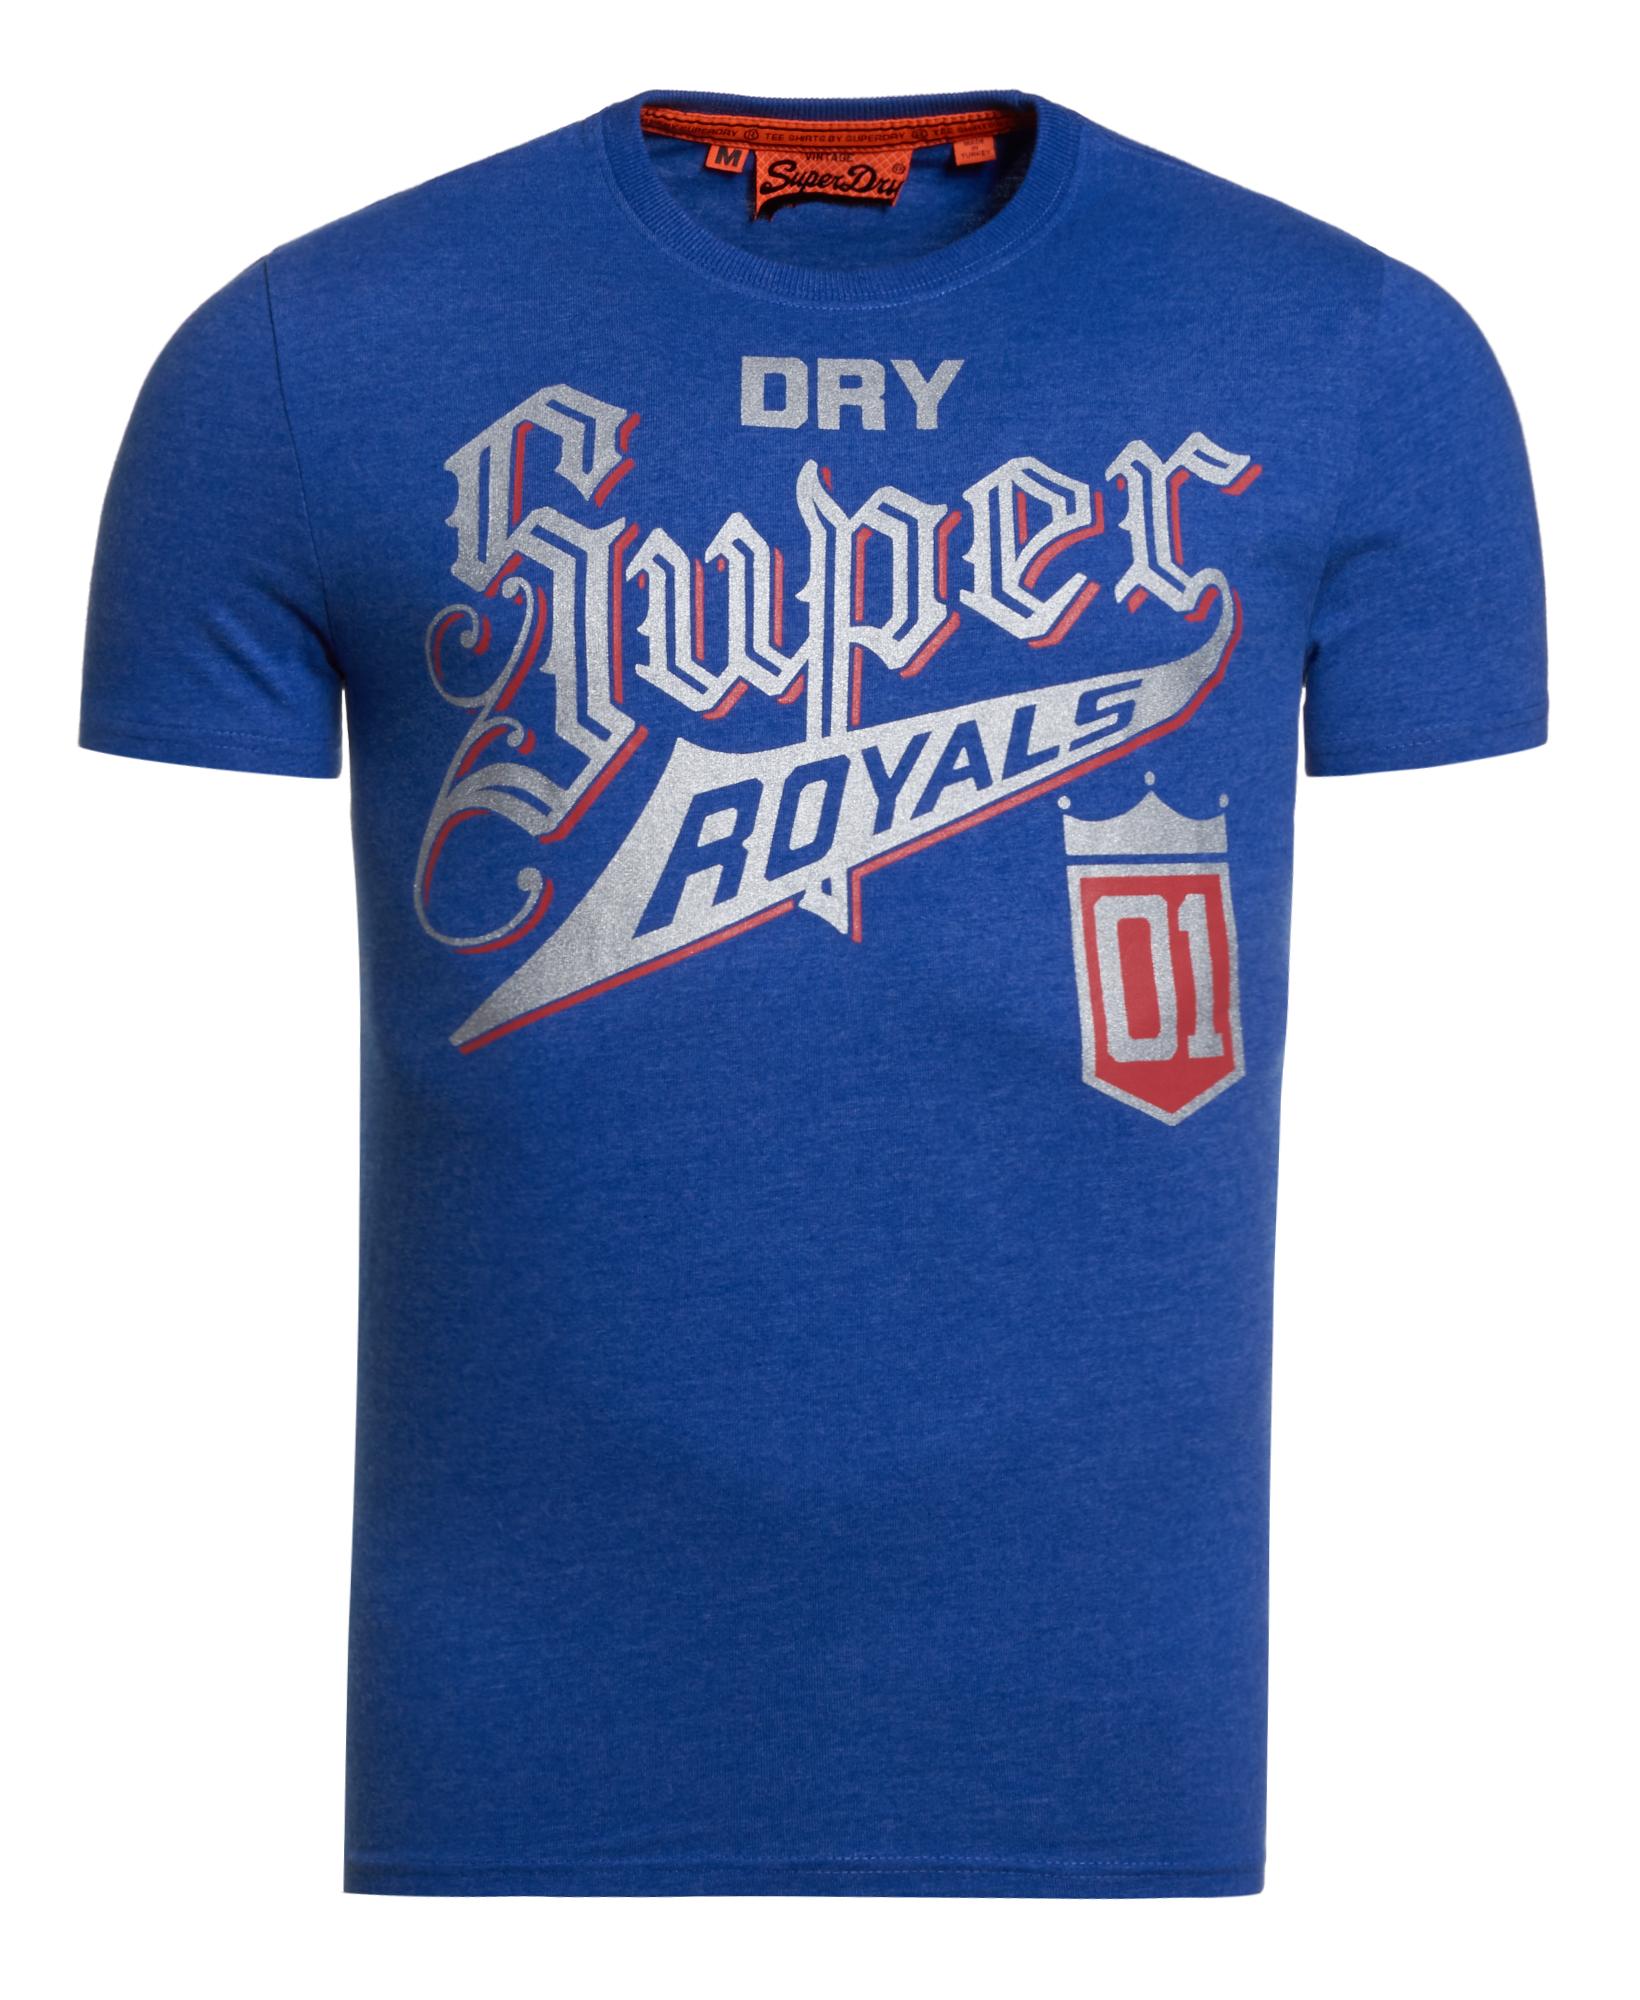 New mens superdry royals tin tab t shirt ocean blue marl for Ocean blue t shirt